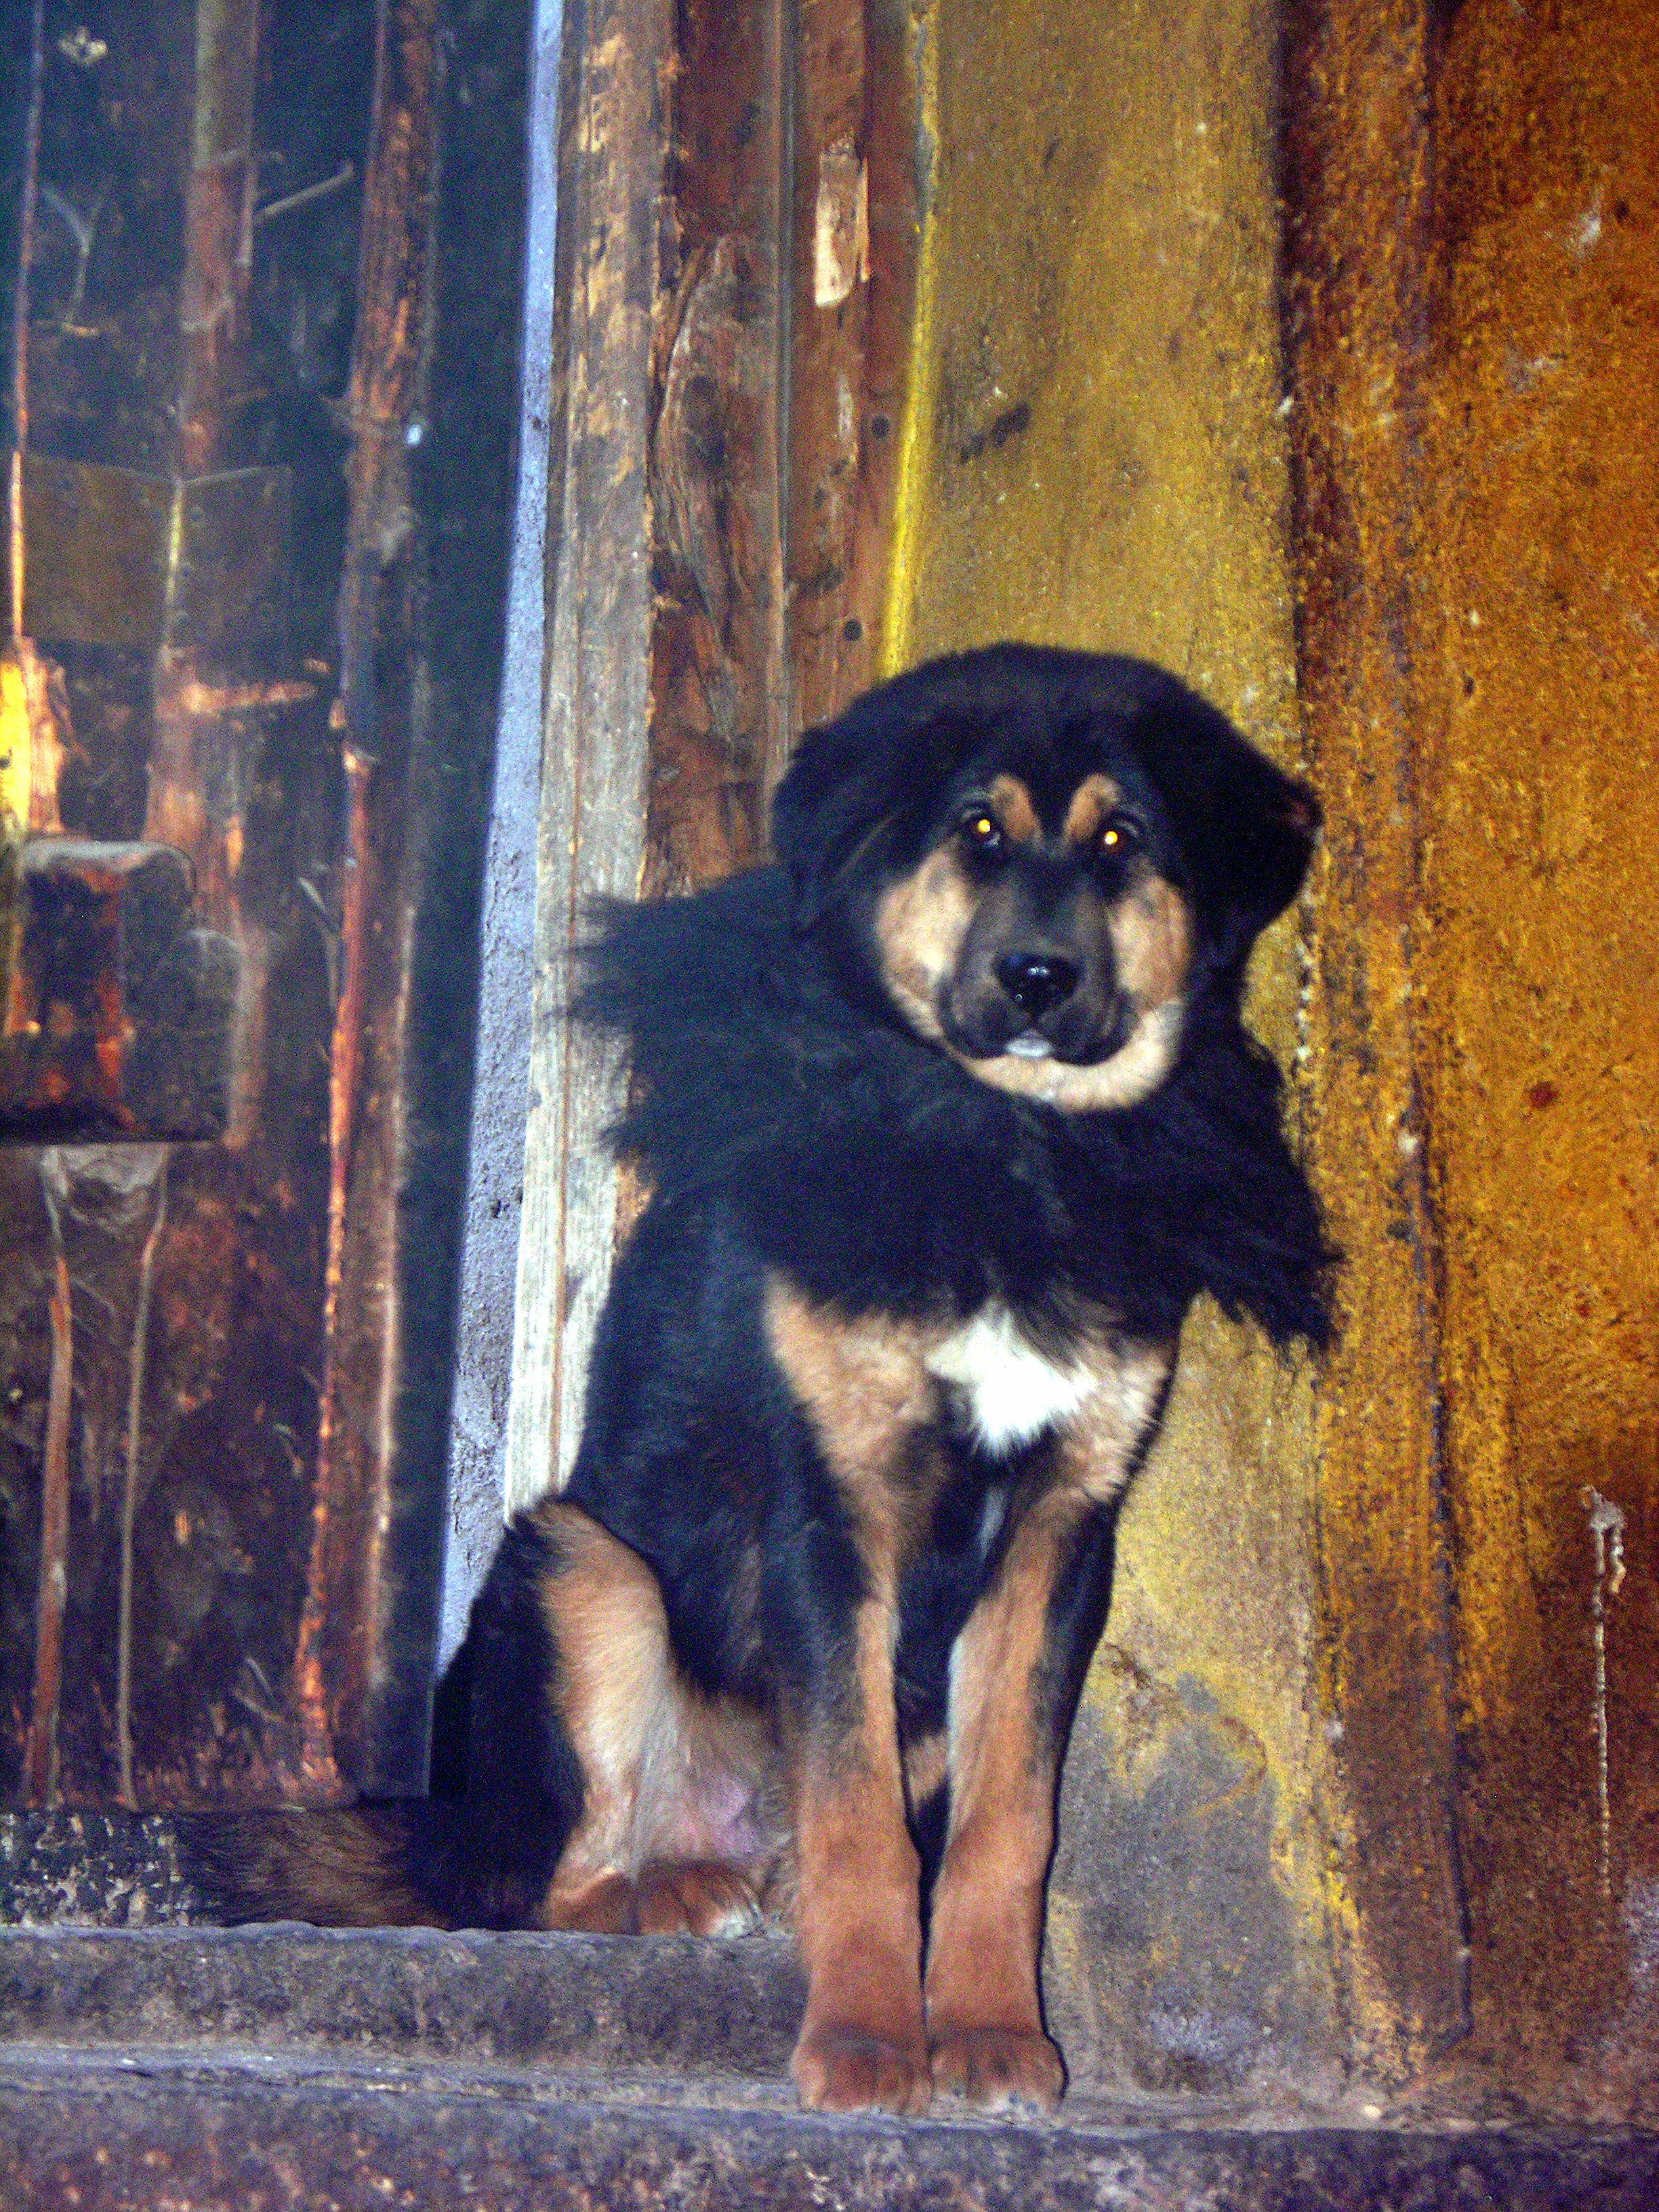 File:Tibetan Mastiff (2642055070) jpg - Wikimedia Commons